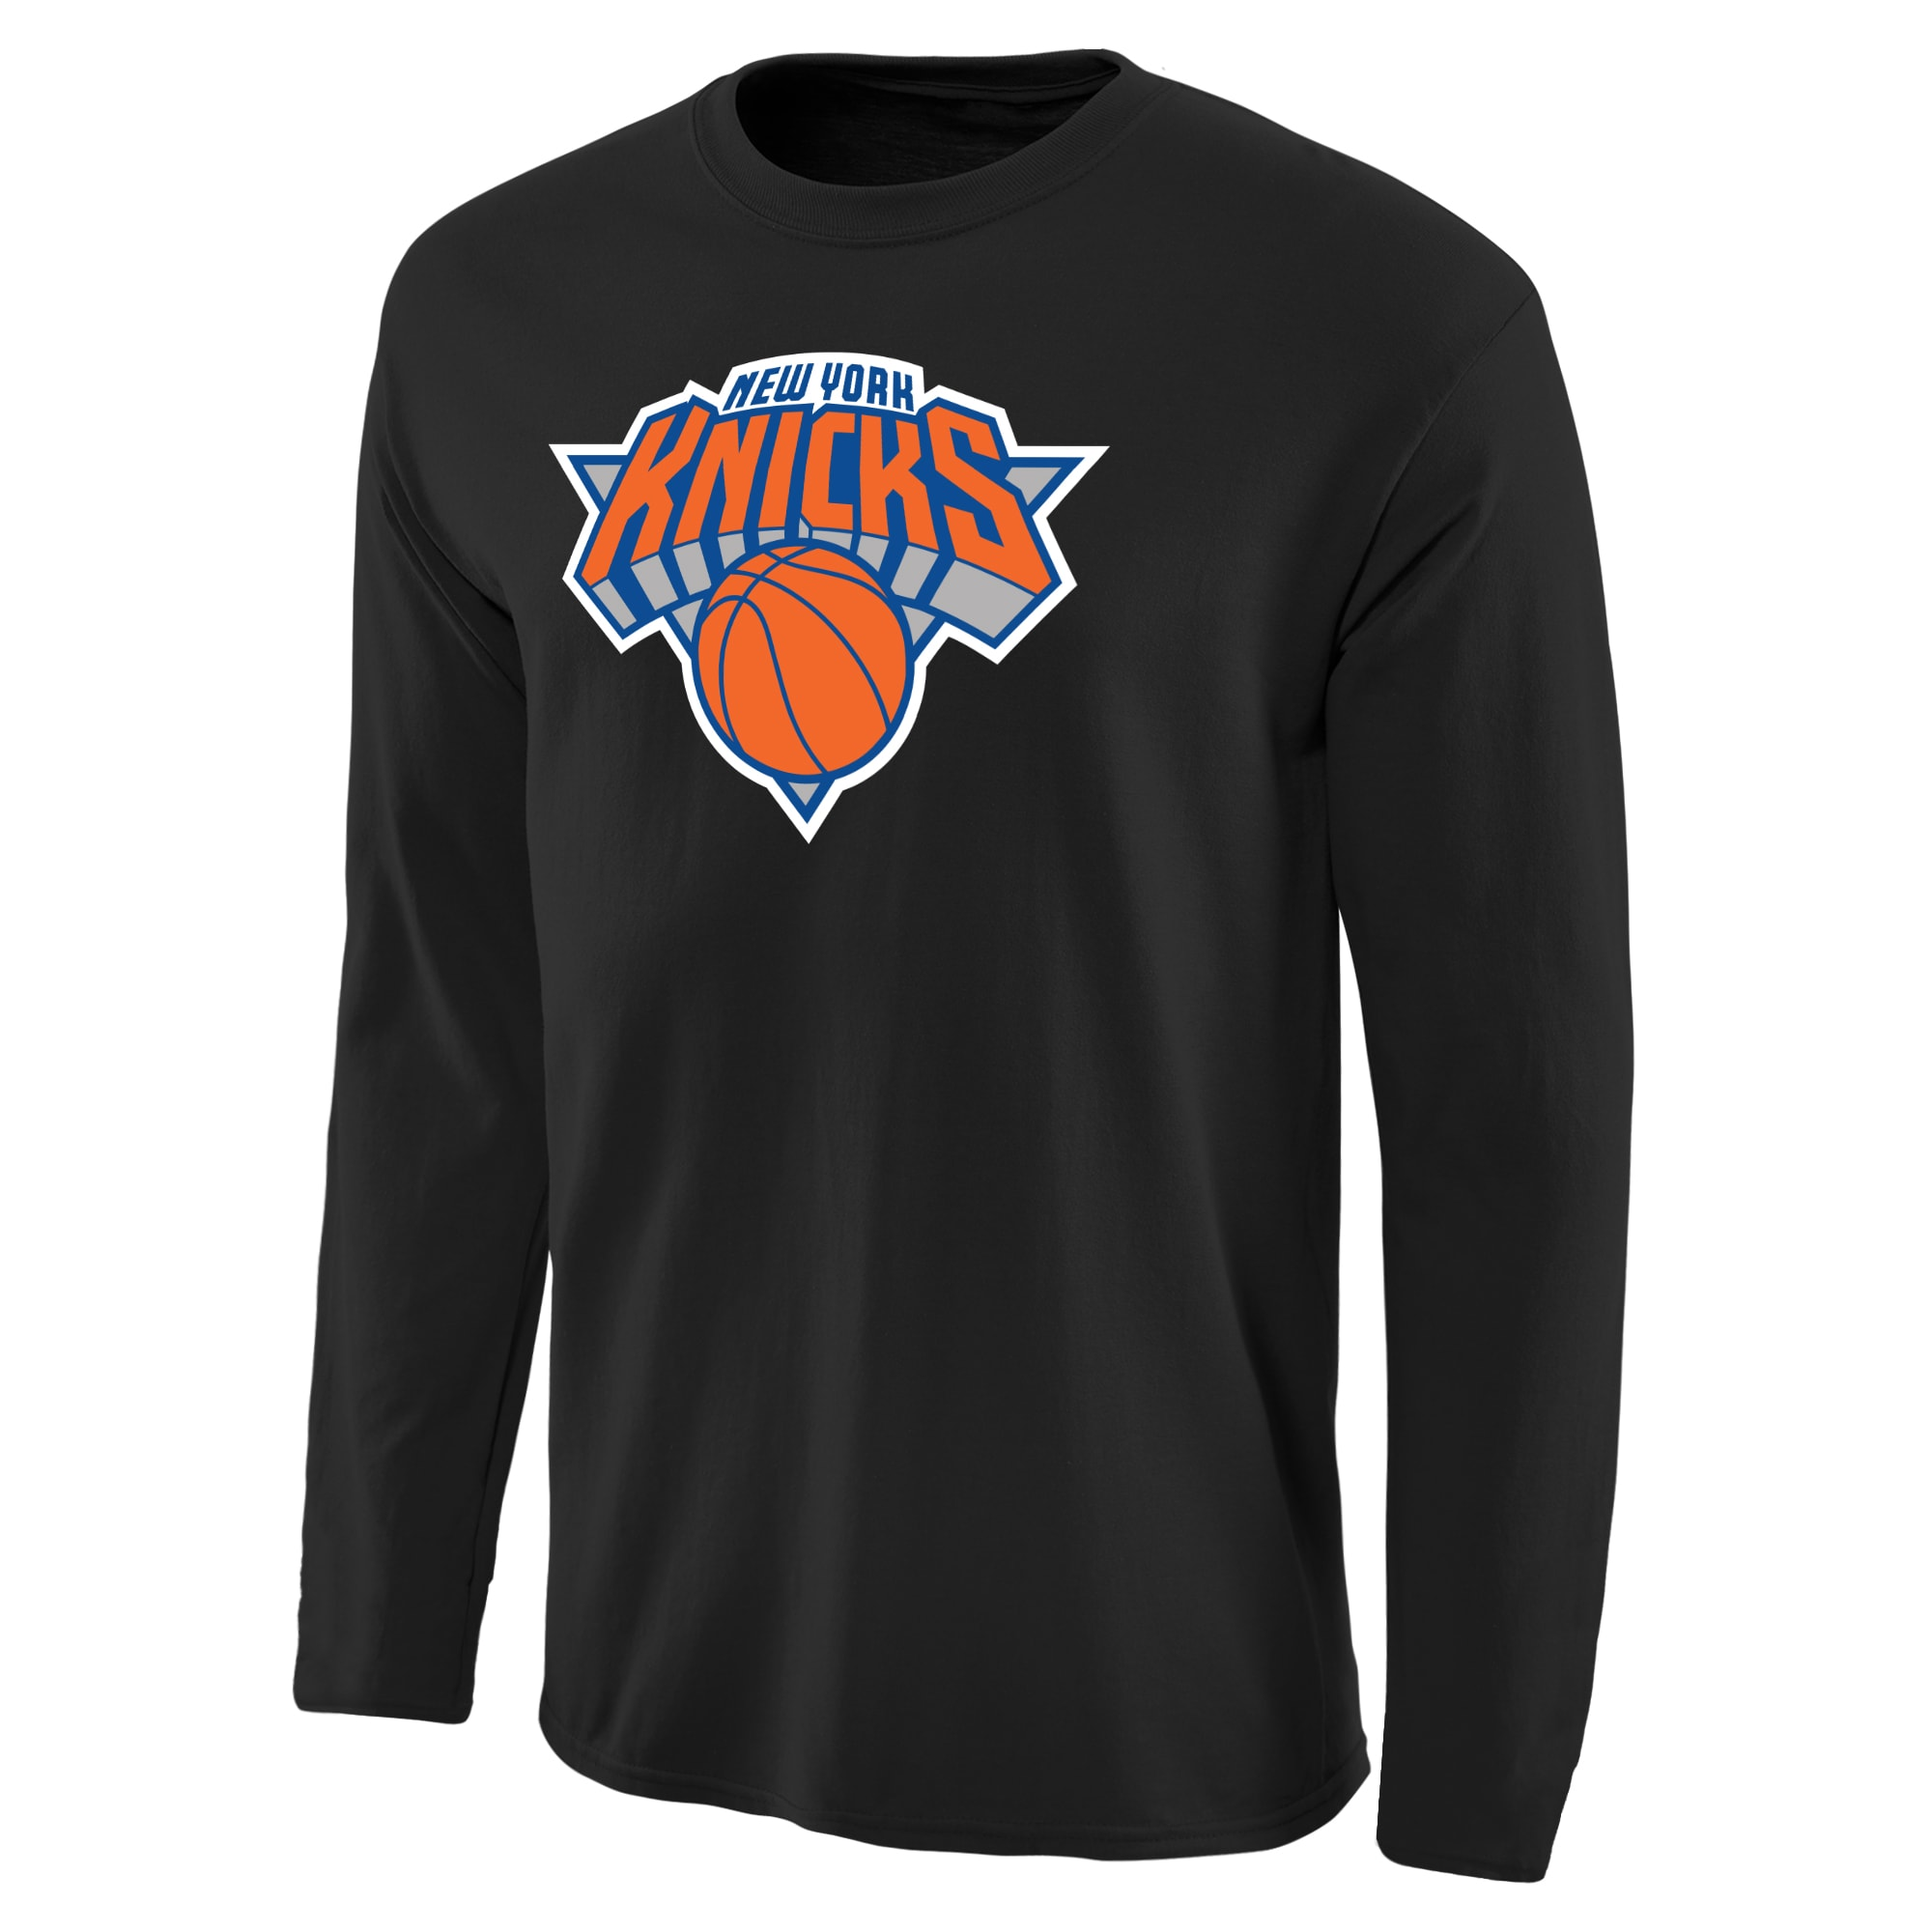 New York Knicks Fanatics Branded Primary Logo Long Sleeve T-Shirt - Black